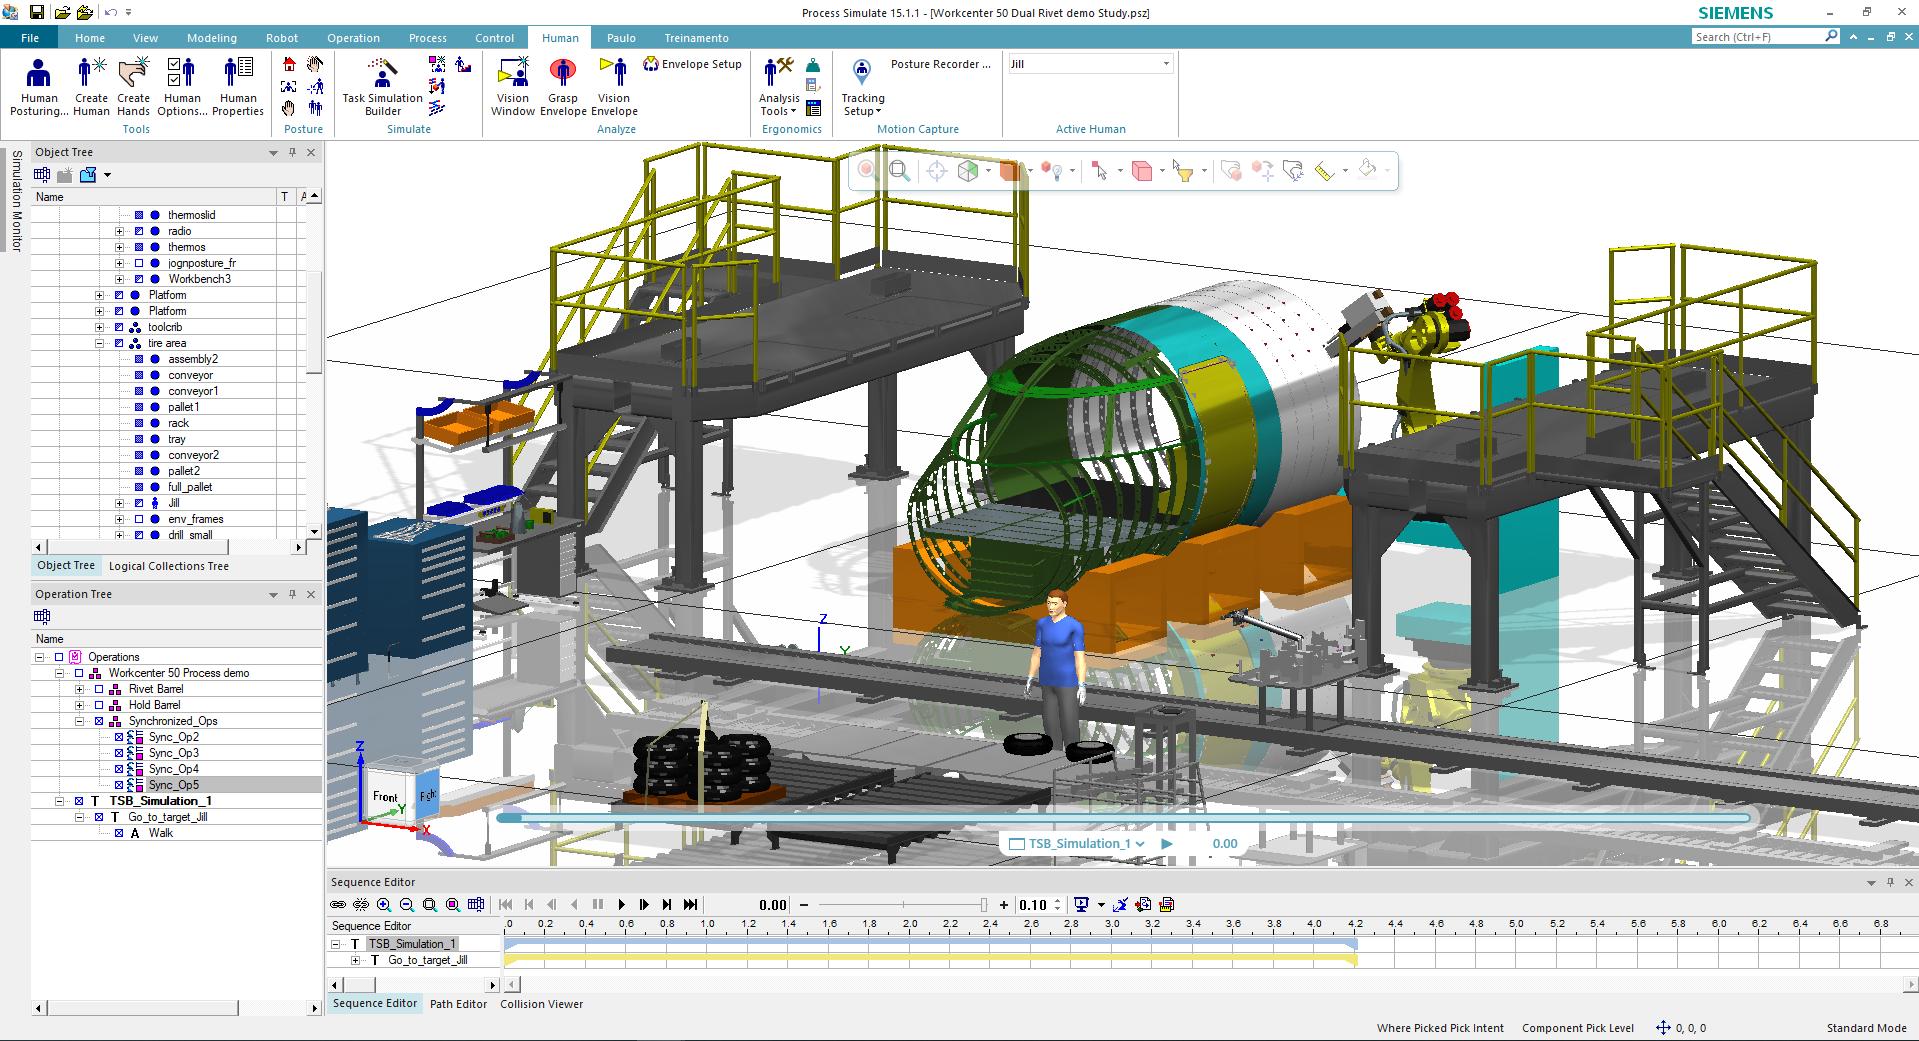 Process Simulate Licença Brasil Siemens SmartPLM Partner Revenda